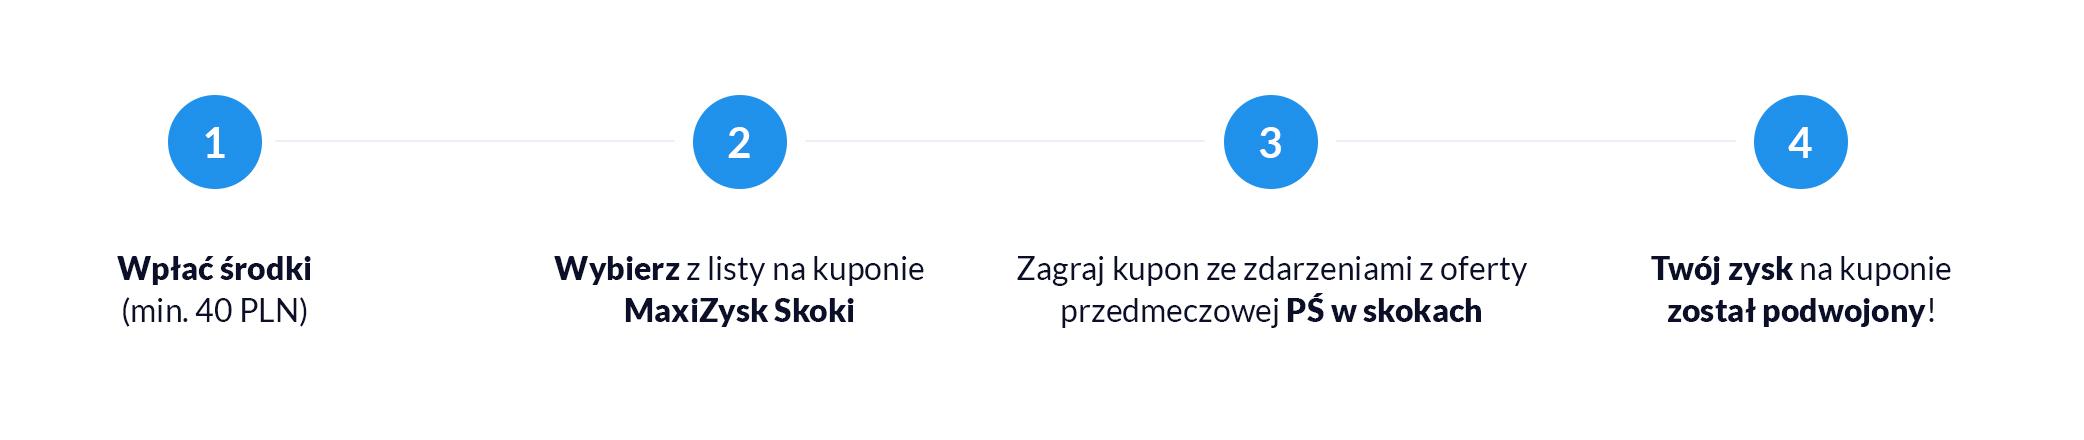 maxizysk-skoki_stepper_desktop2.jpg